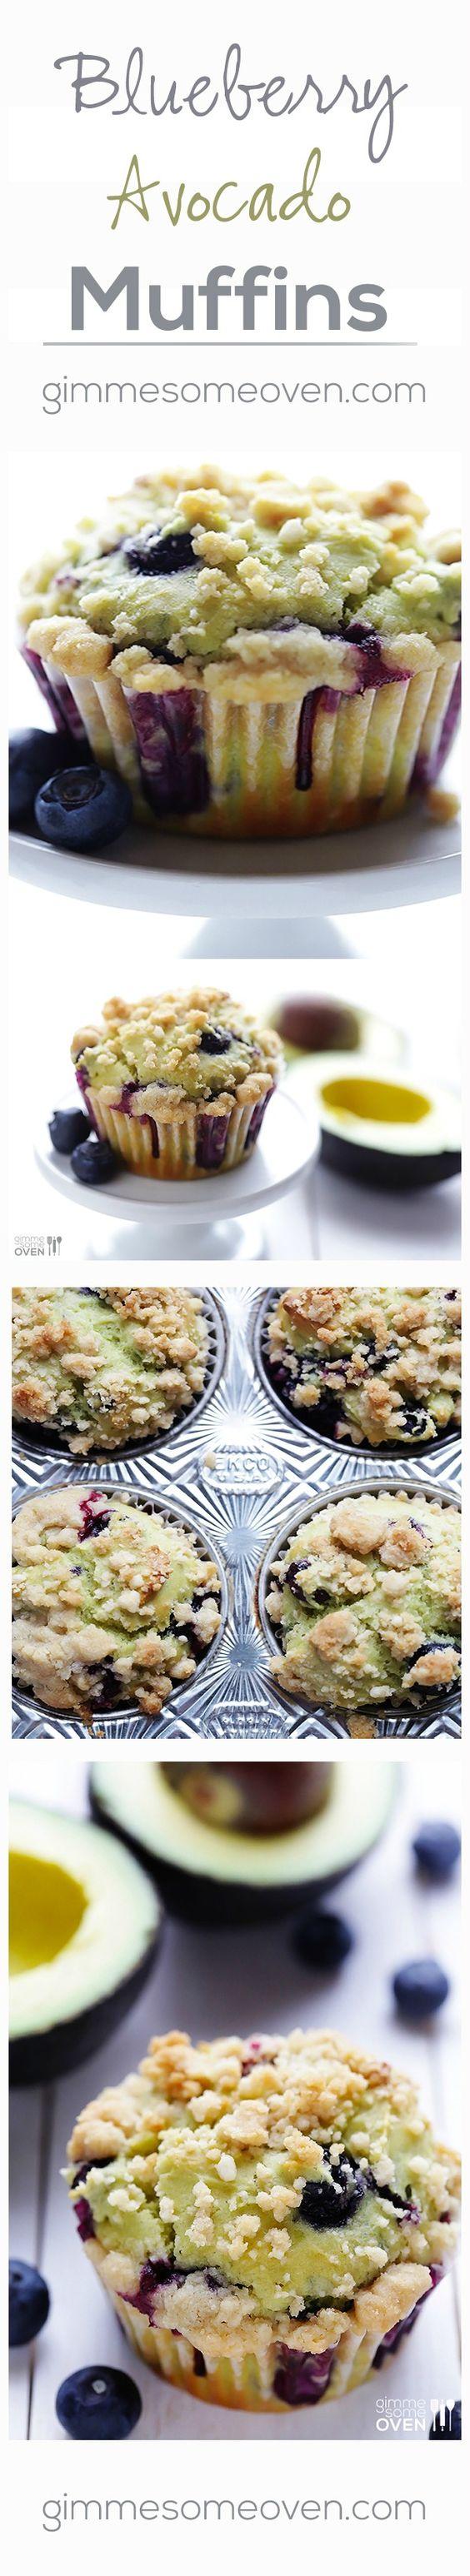 Blueberry Avocado Muffins via gimmesomeoven// #avocado #muffins #blueberry. Needs some healthy substitutions